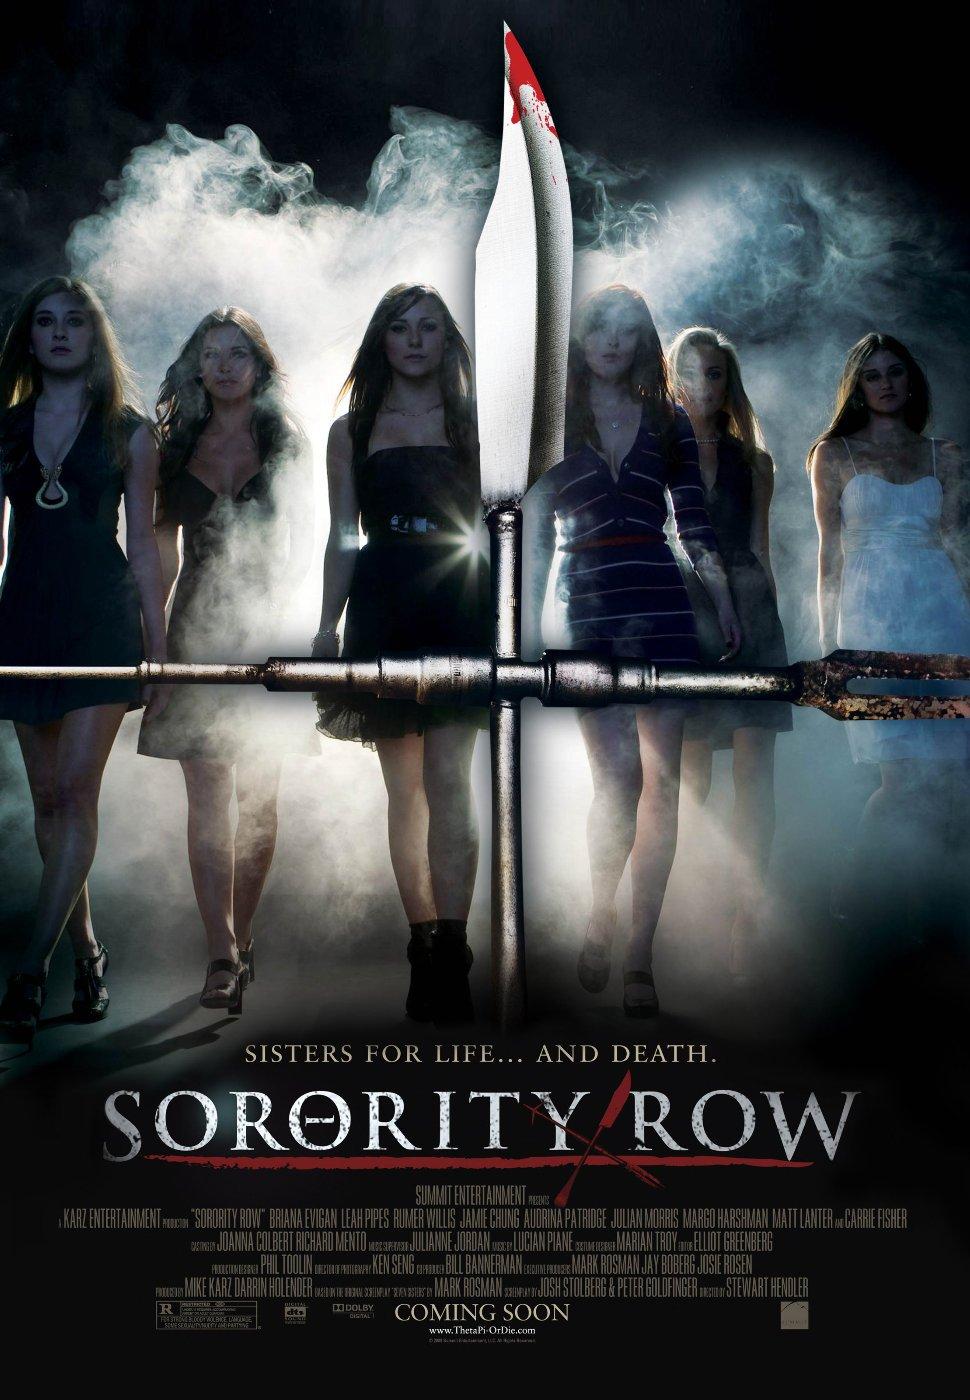 Sorority Row (2009) poster - FreeMoviePosters.net